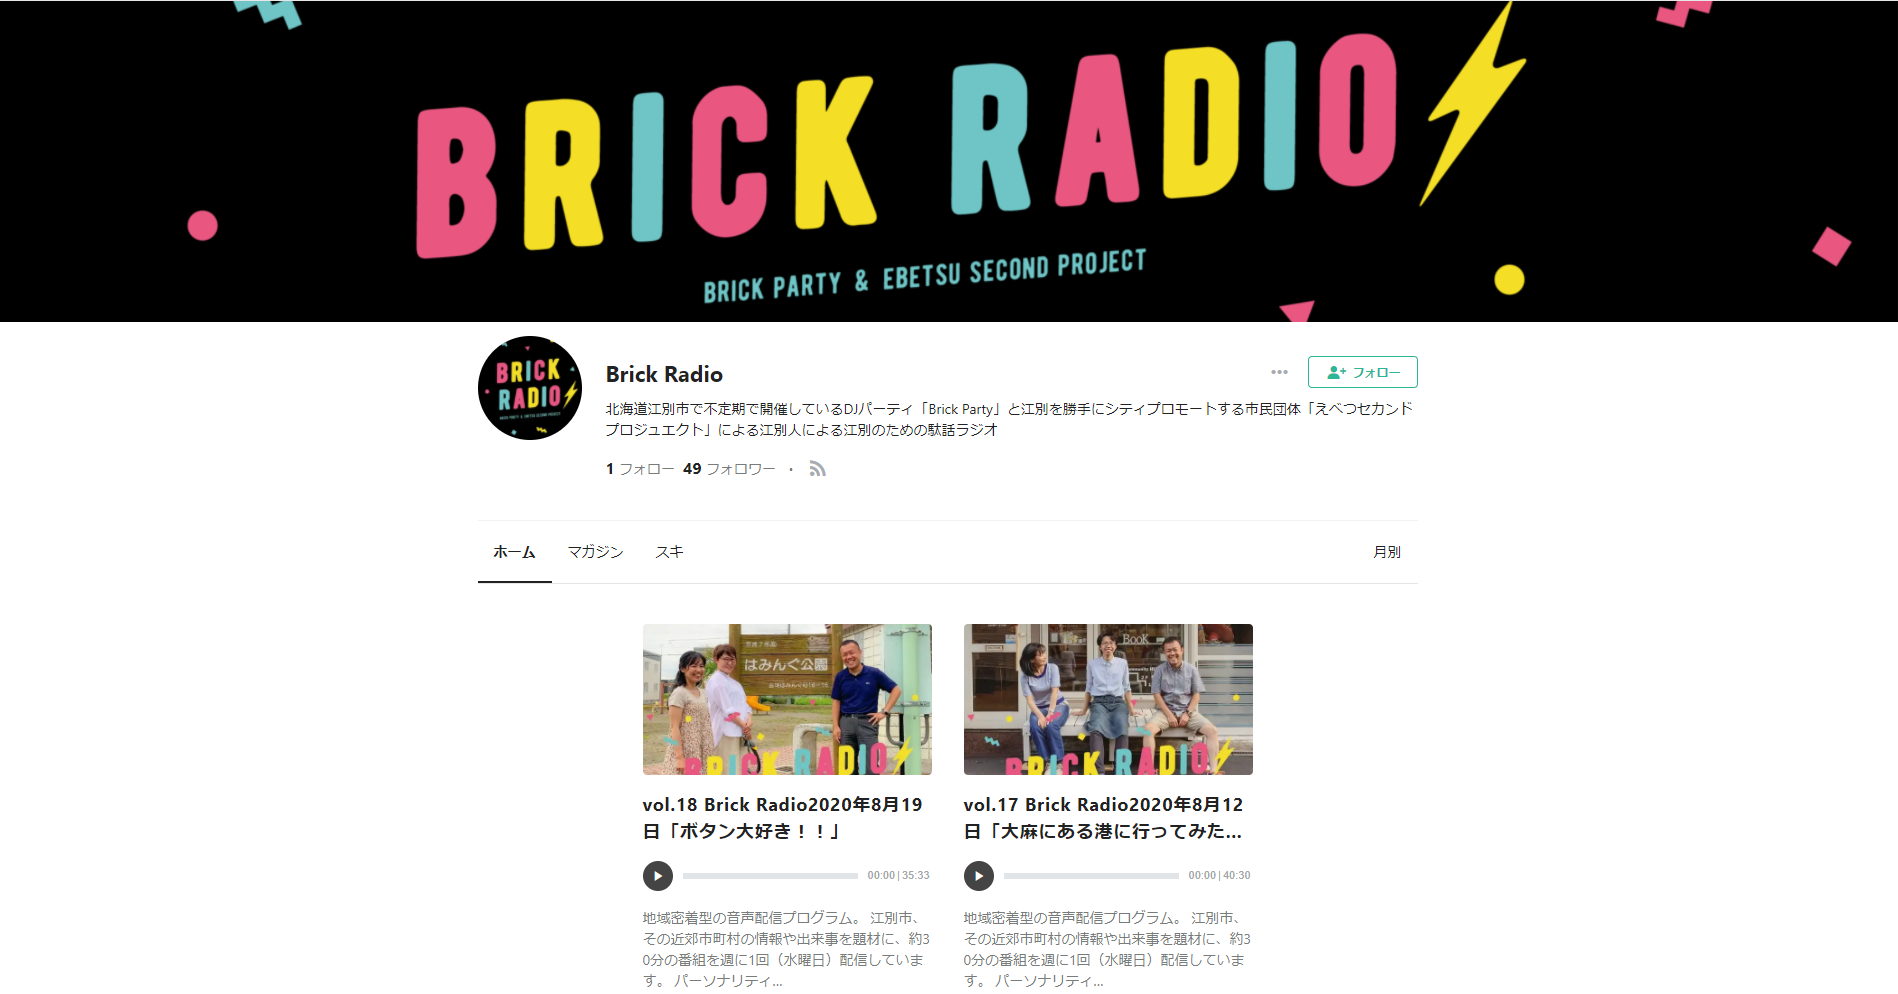 Brick Radio